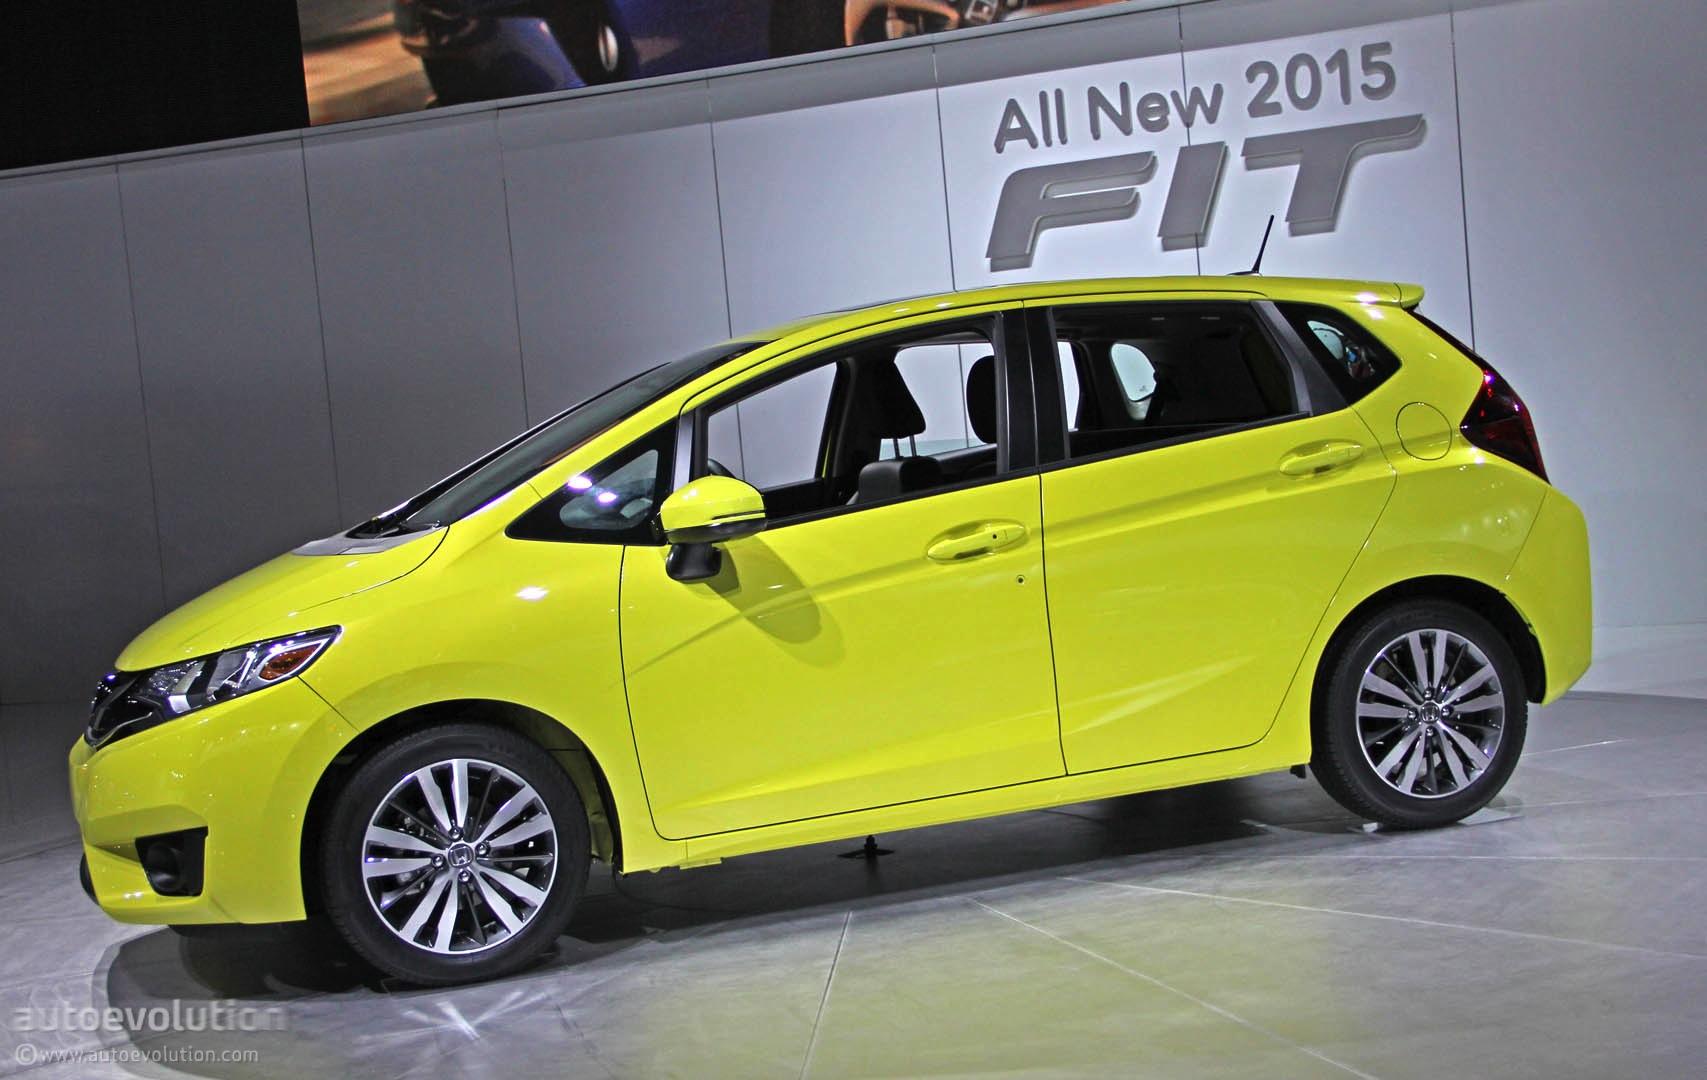 Honda Fit Mpg >> 2015 Honda Fit Debuts In Detroit Gets 41 Mpg Live Photos